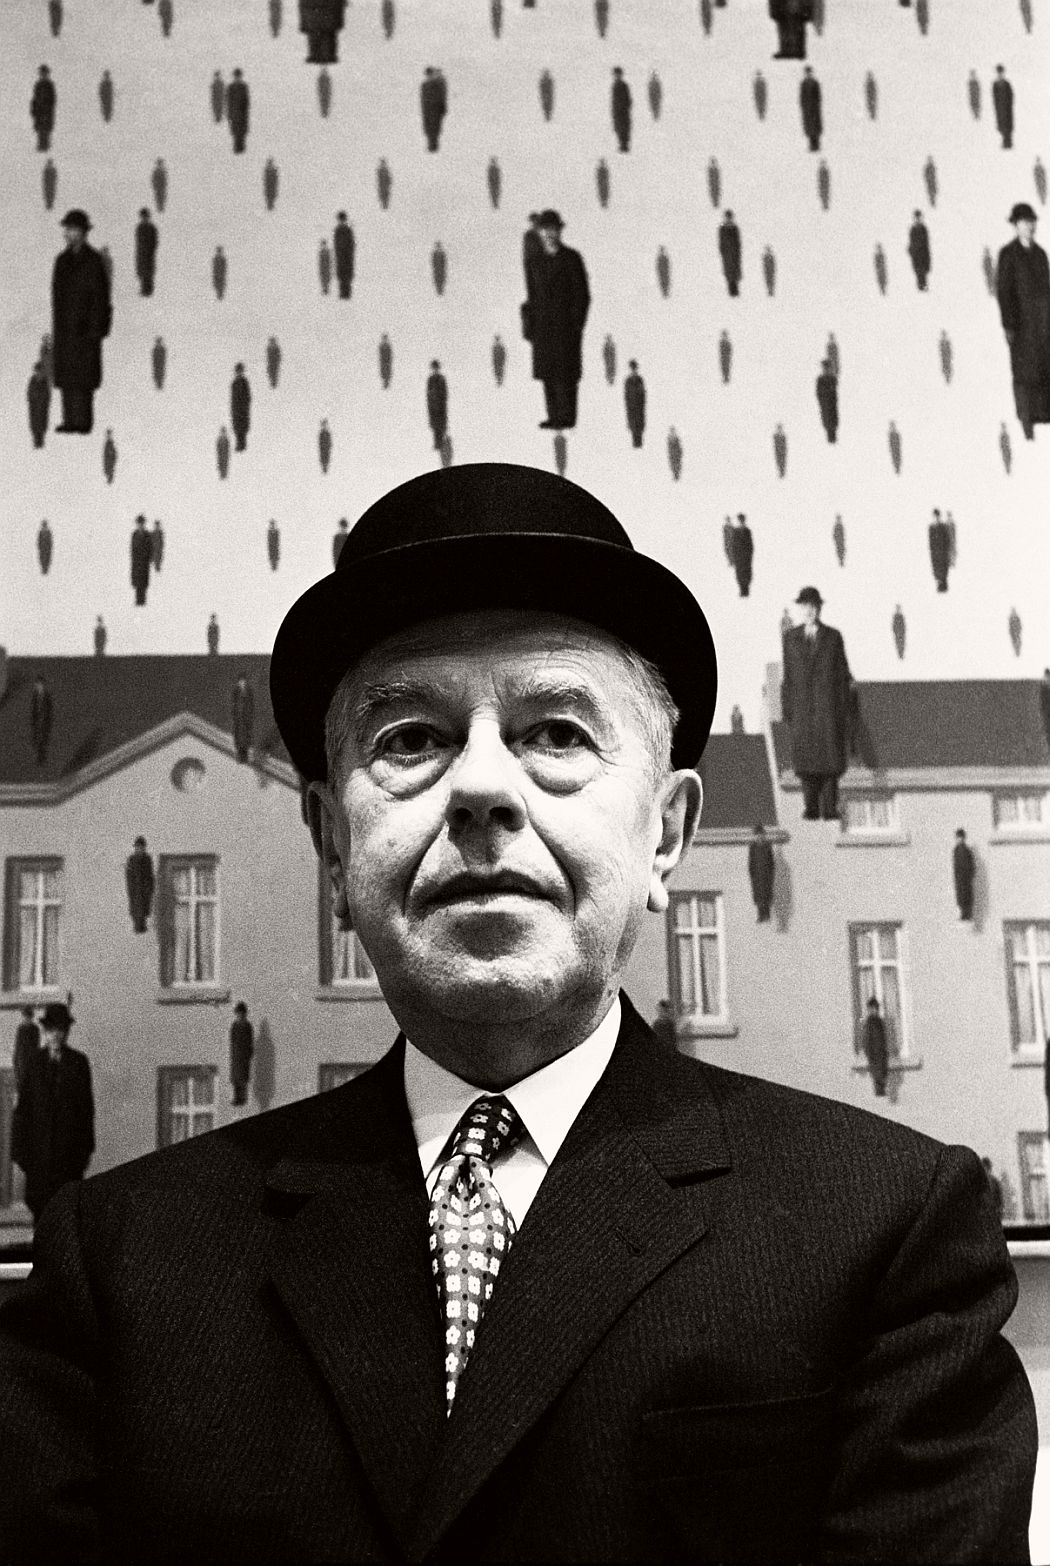 Steve Schapiro René Magritte at MOMA, 1965